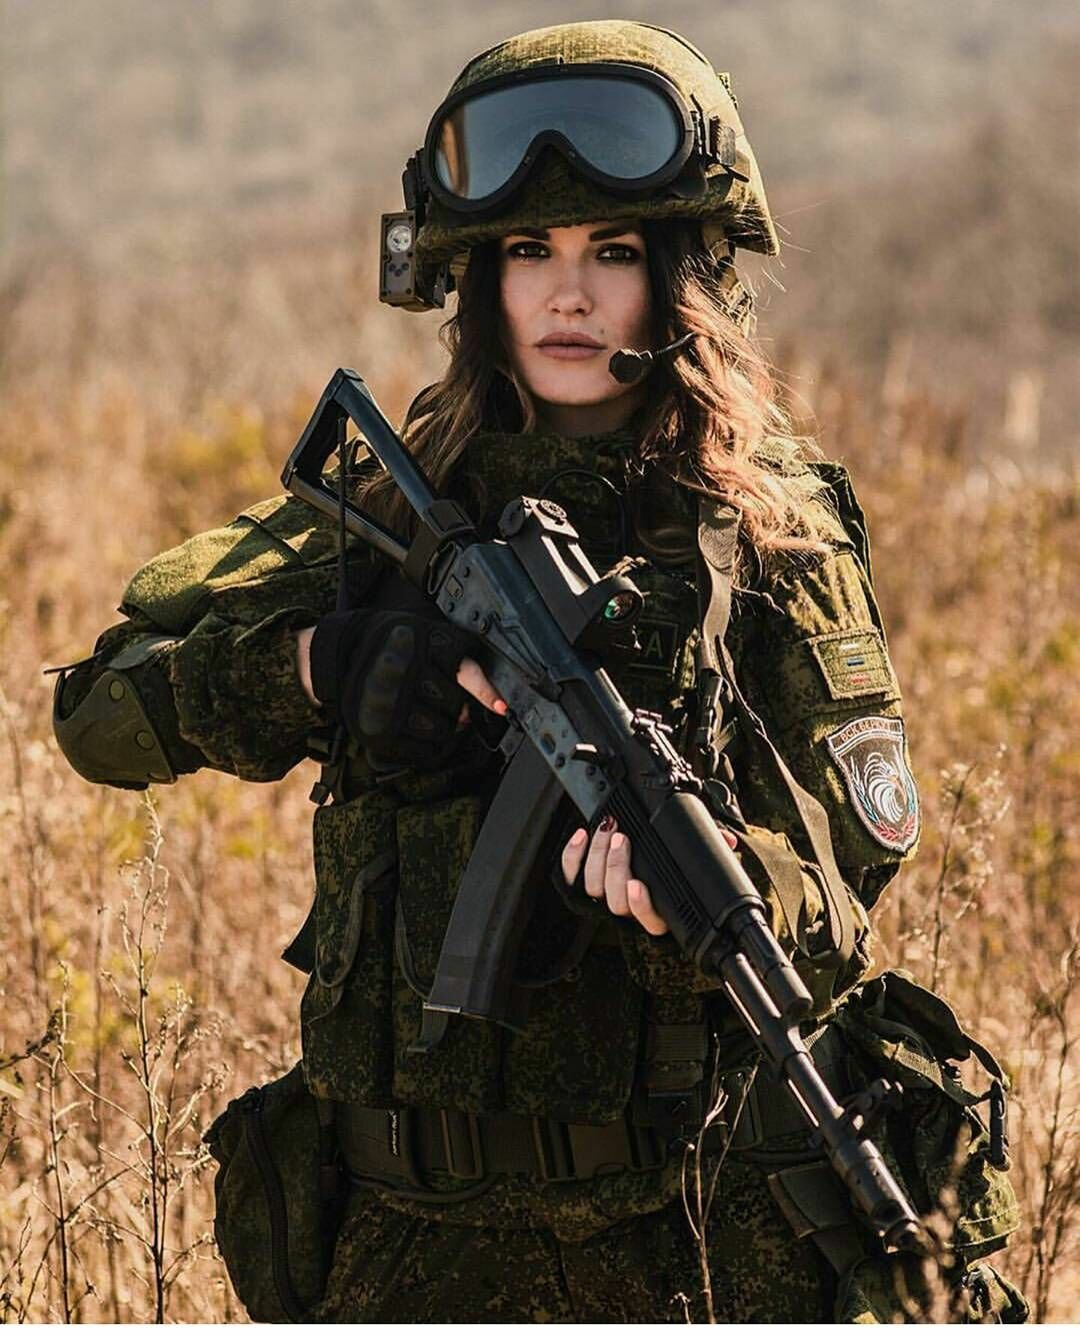 Женская униформа спецназа фото 8